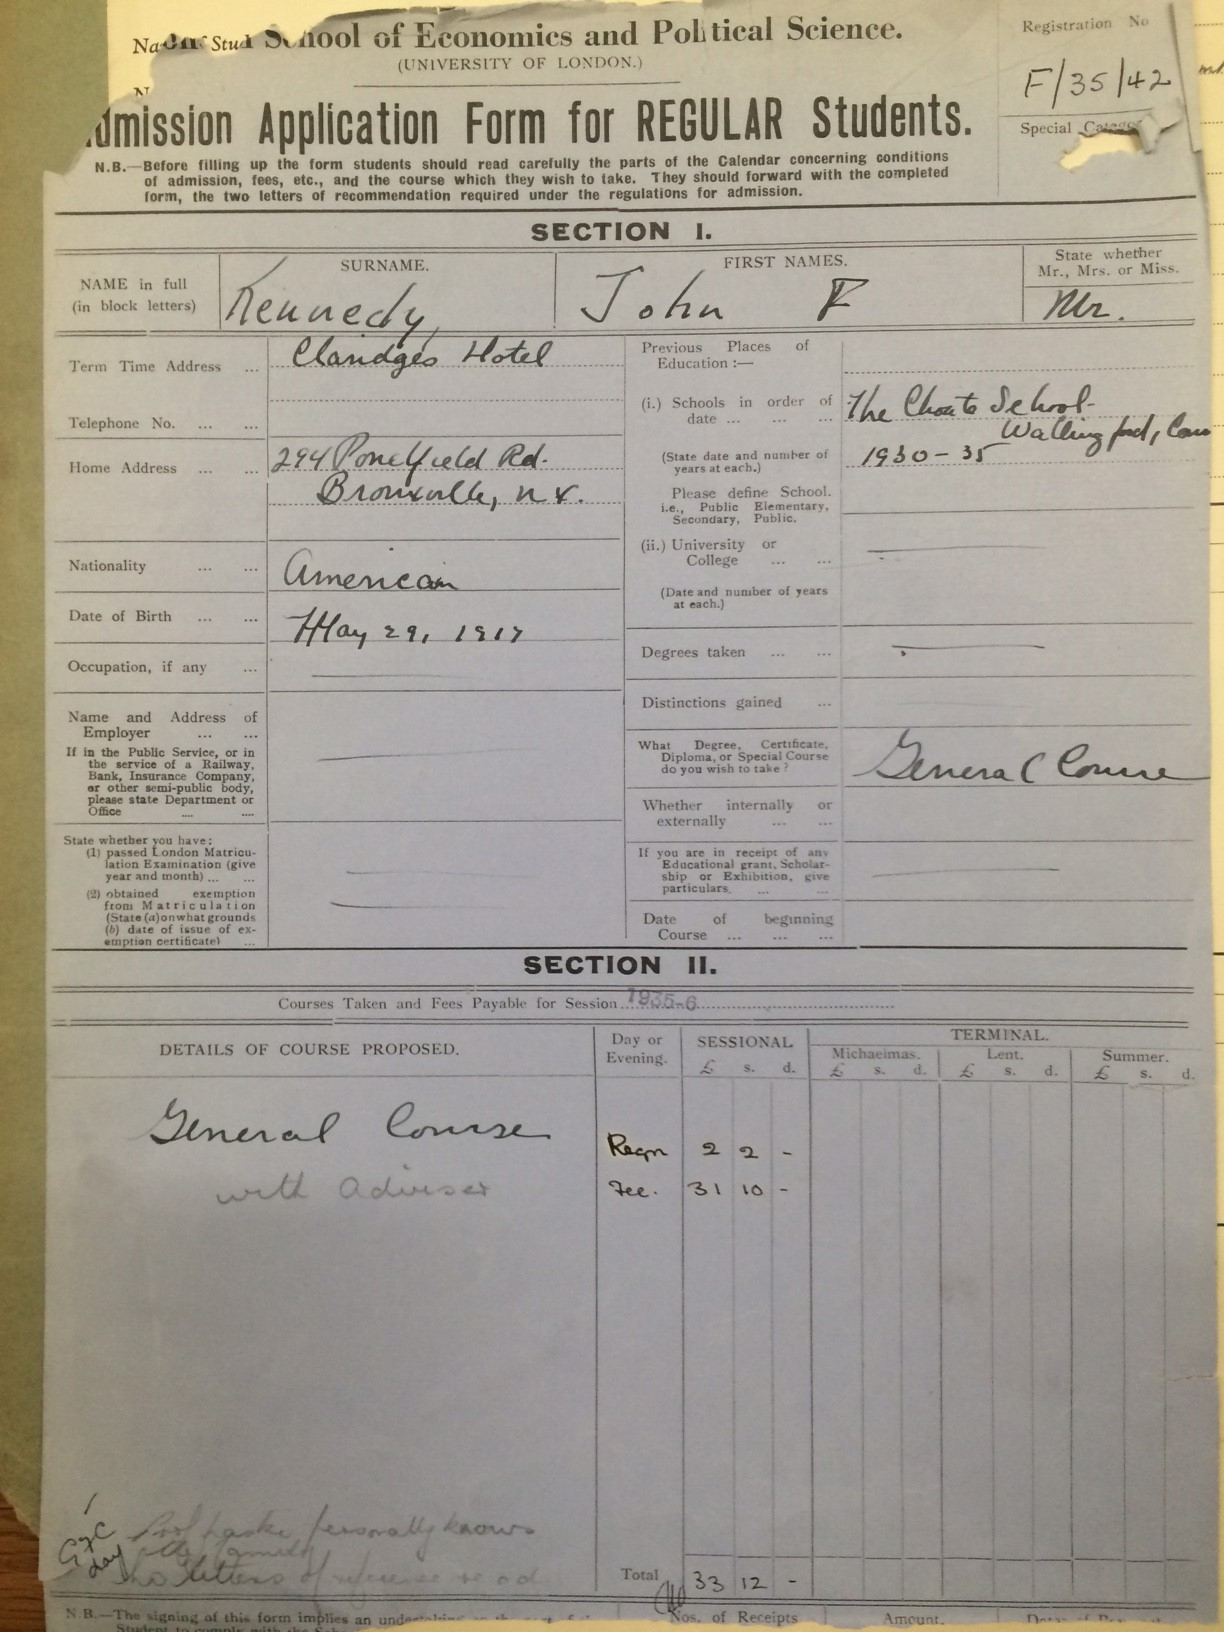 JFK LSE application form